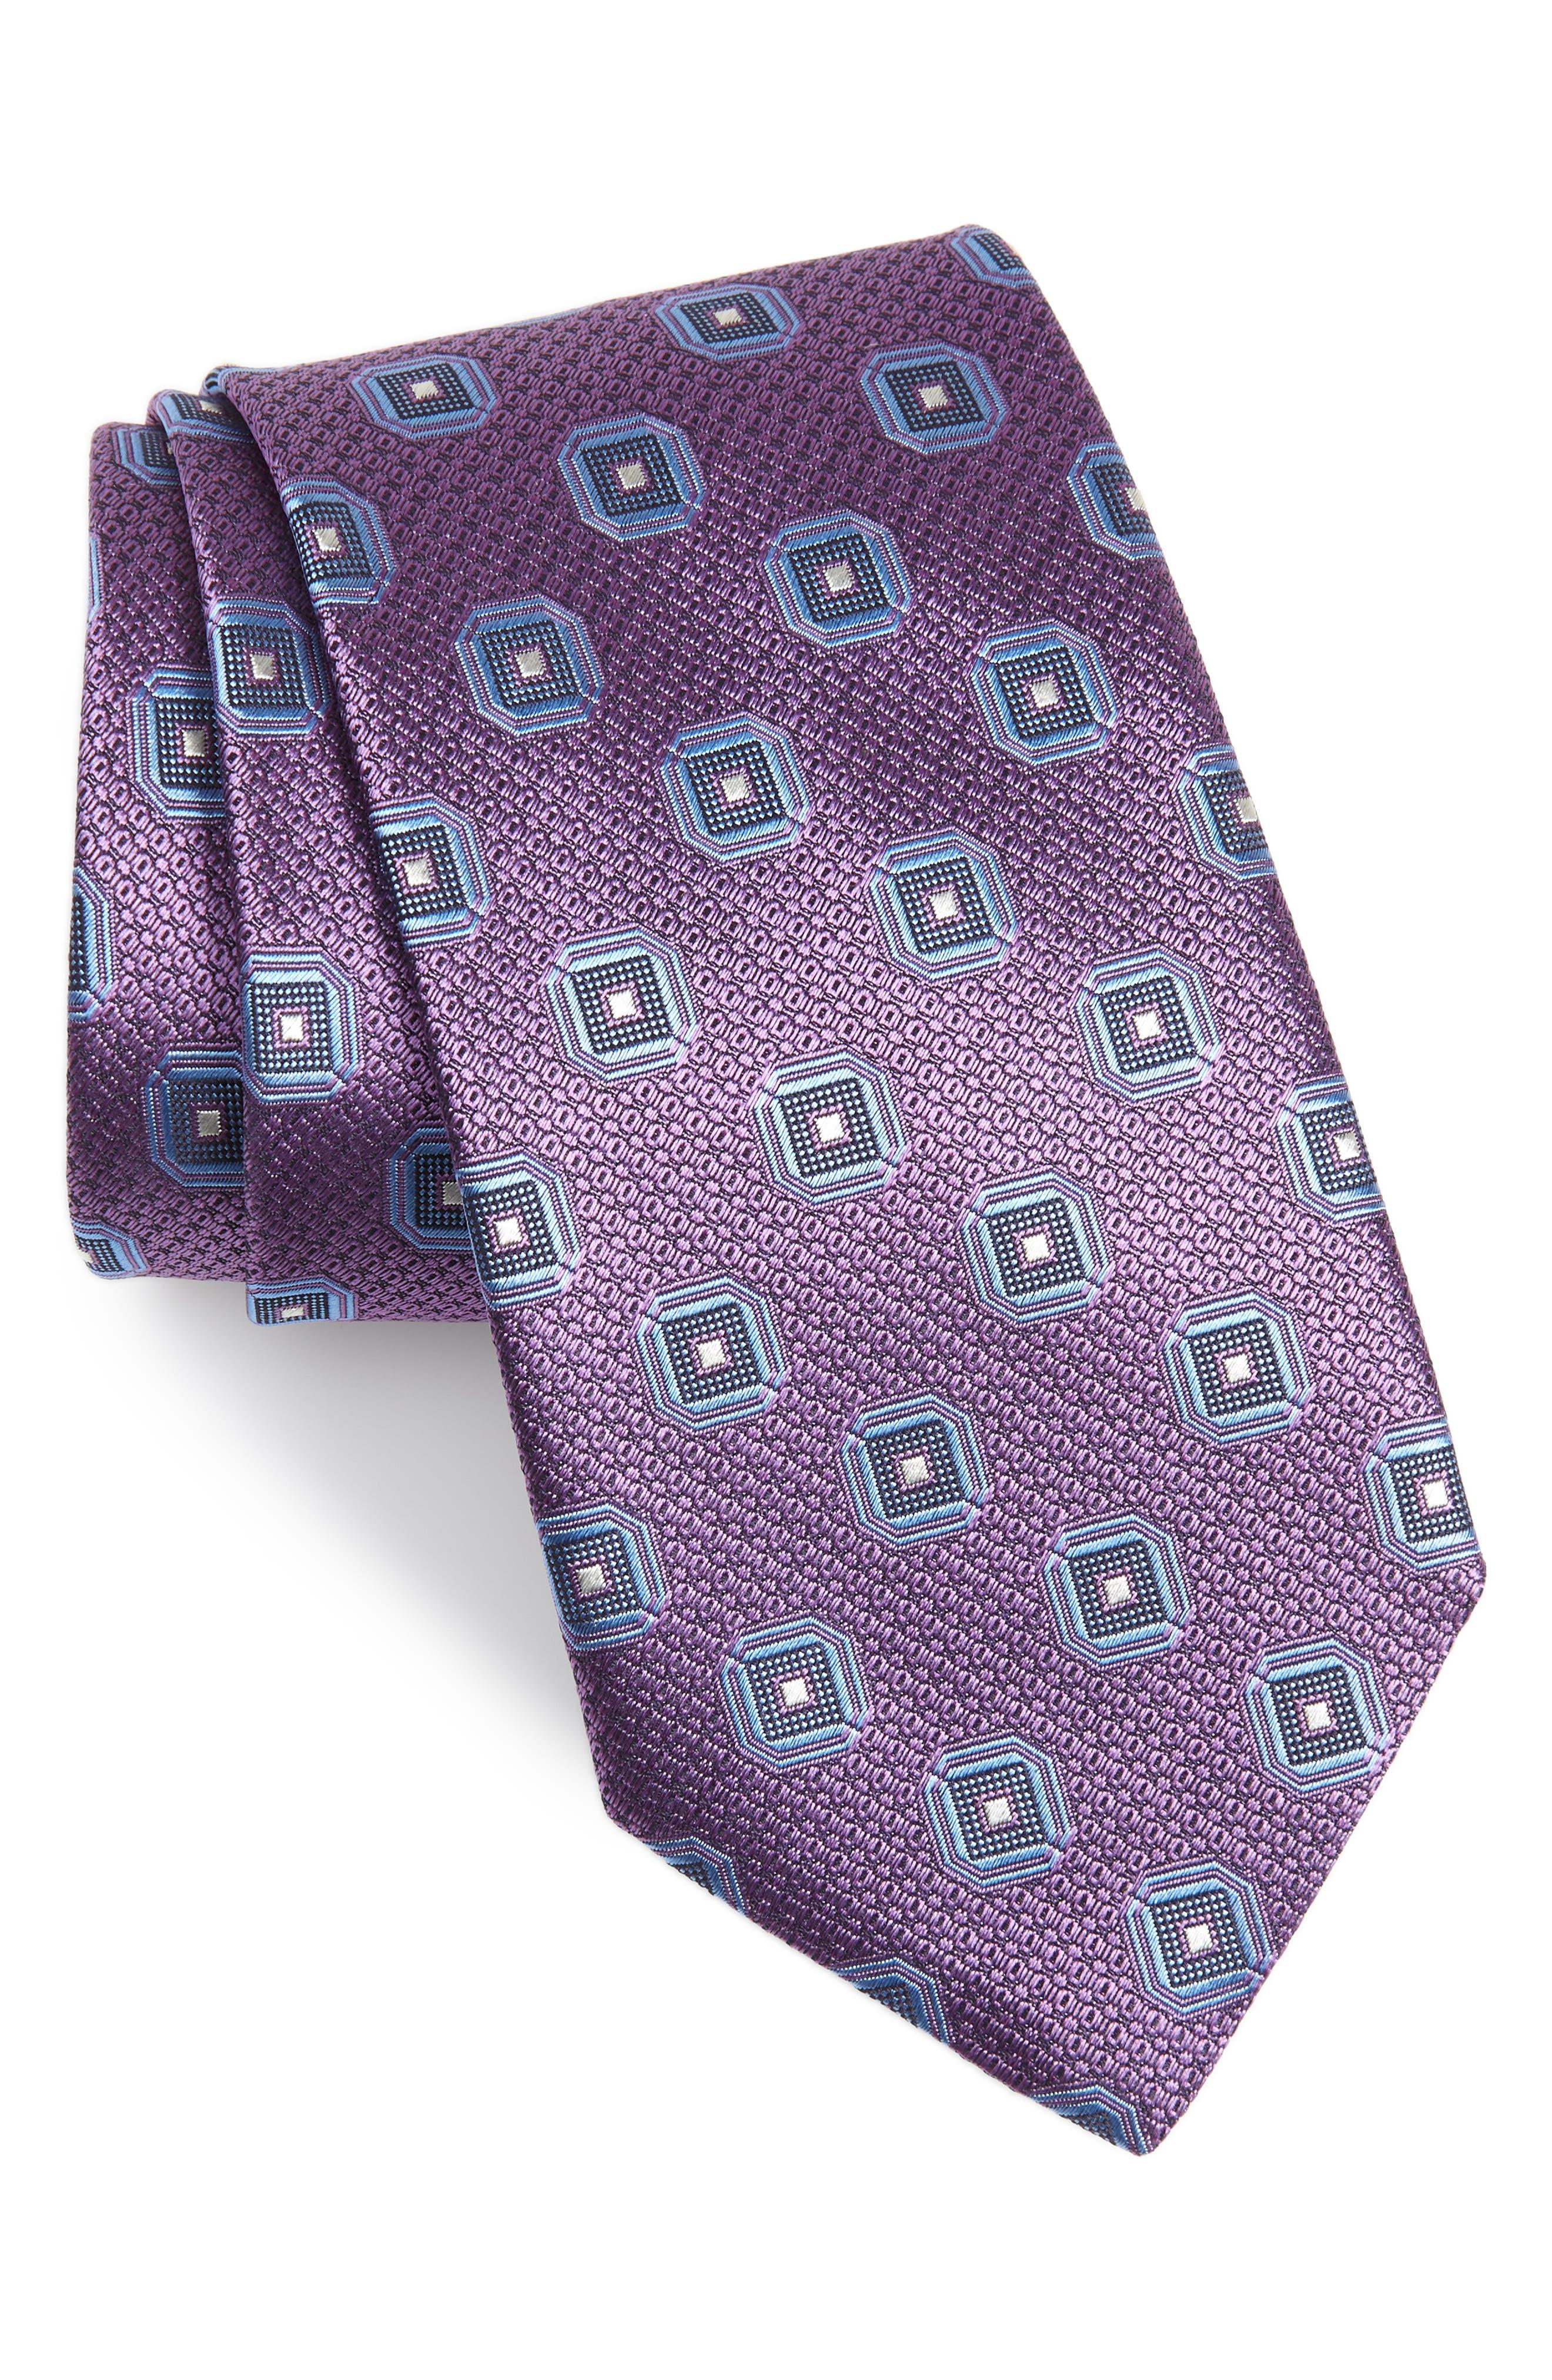 CANALI, Medallion Silk Tie, Main thumbnail 1, color, PURPLE